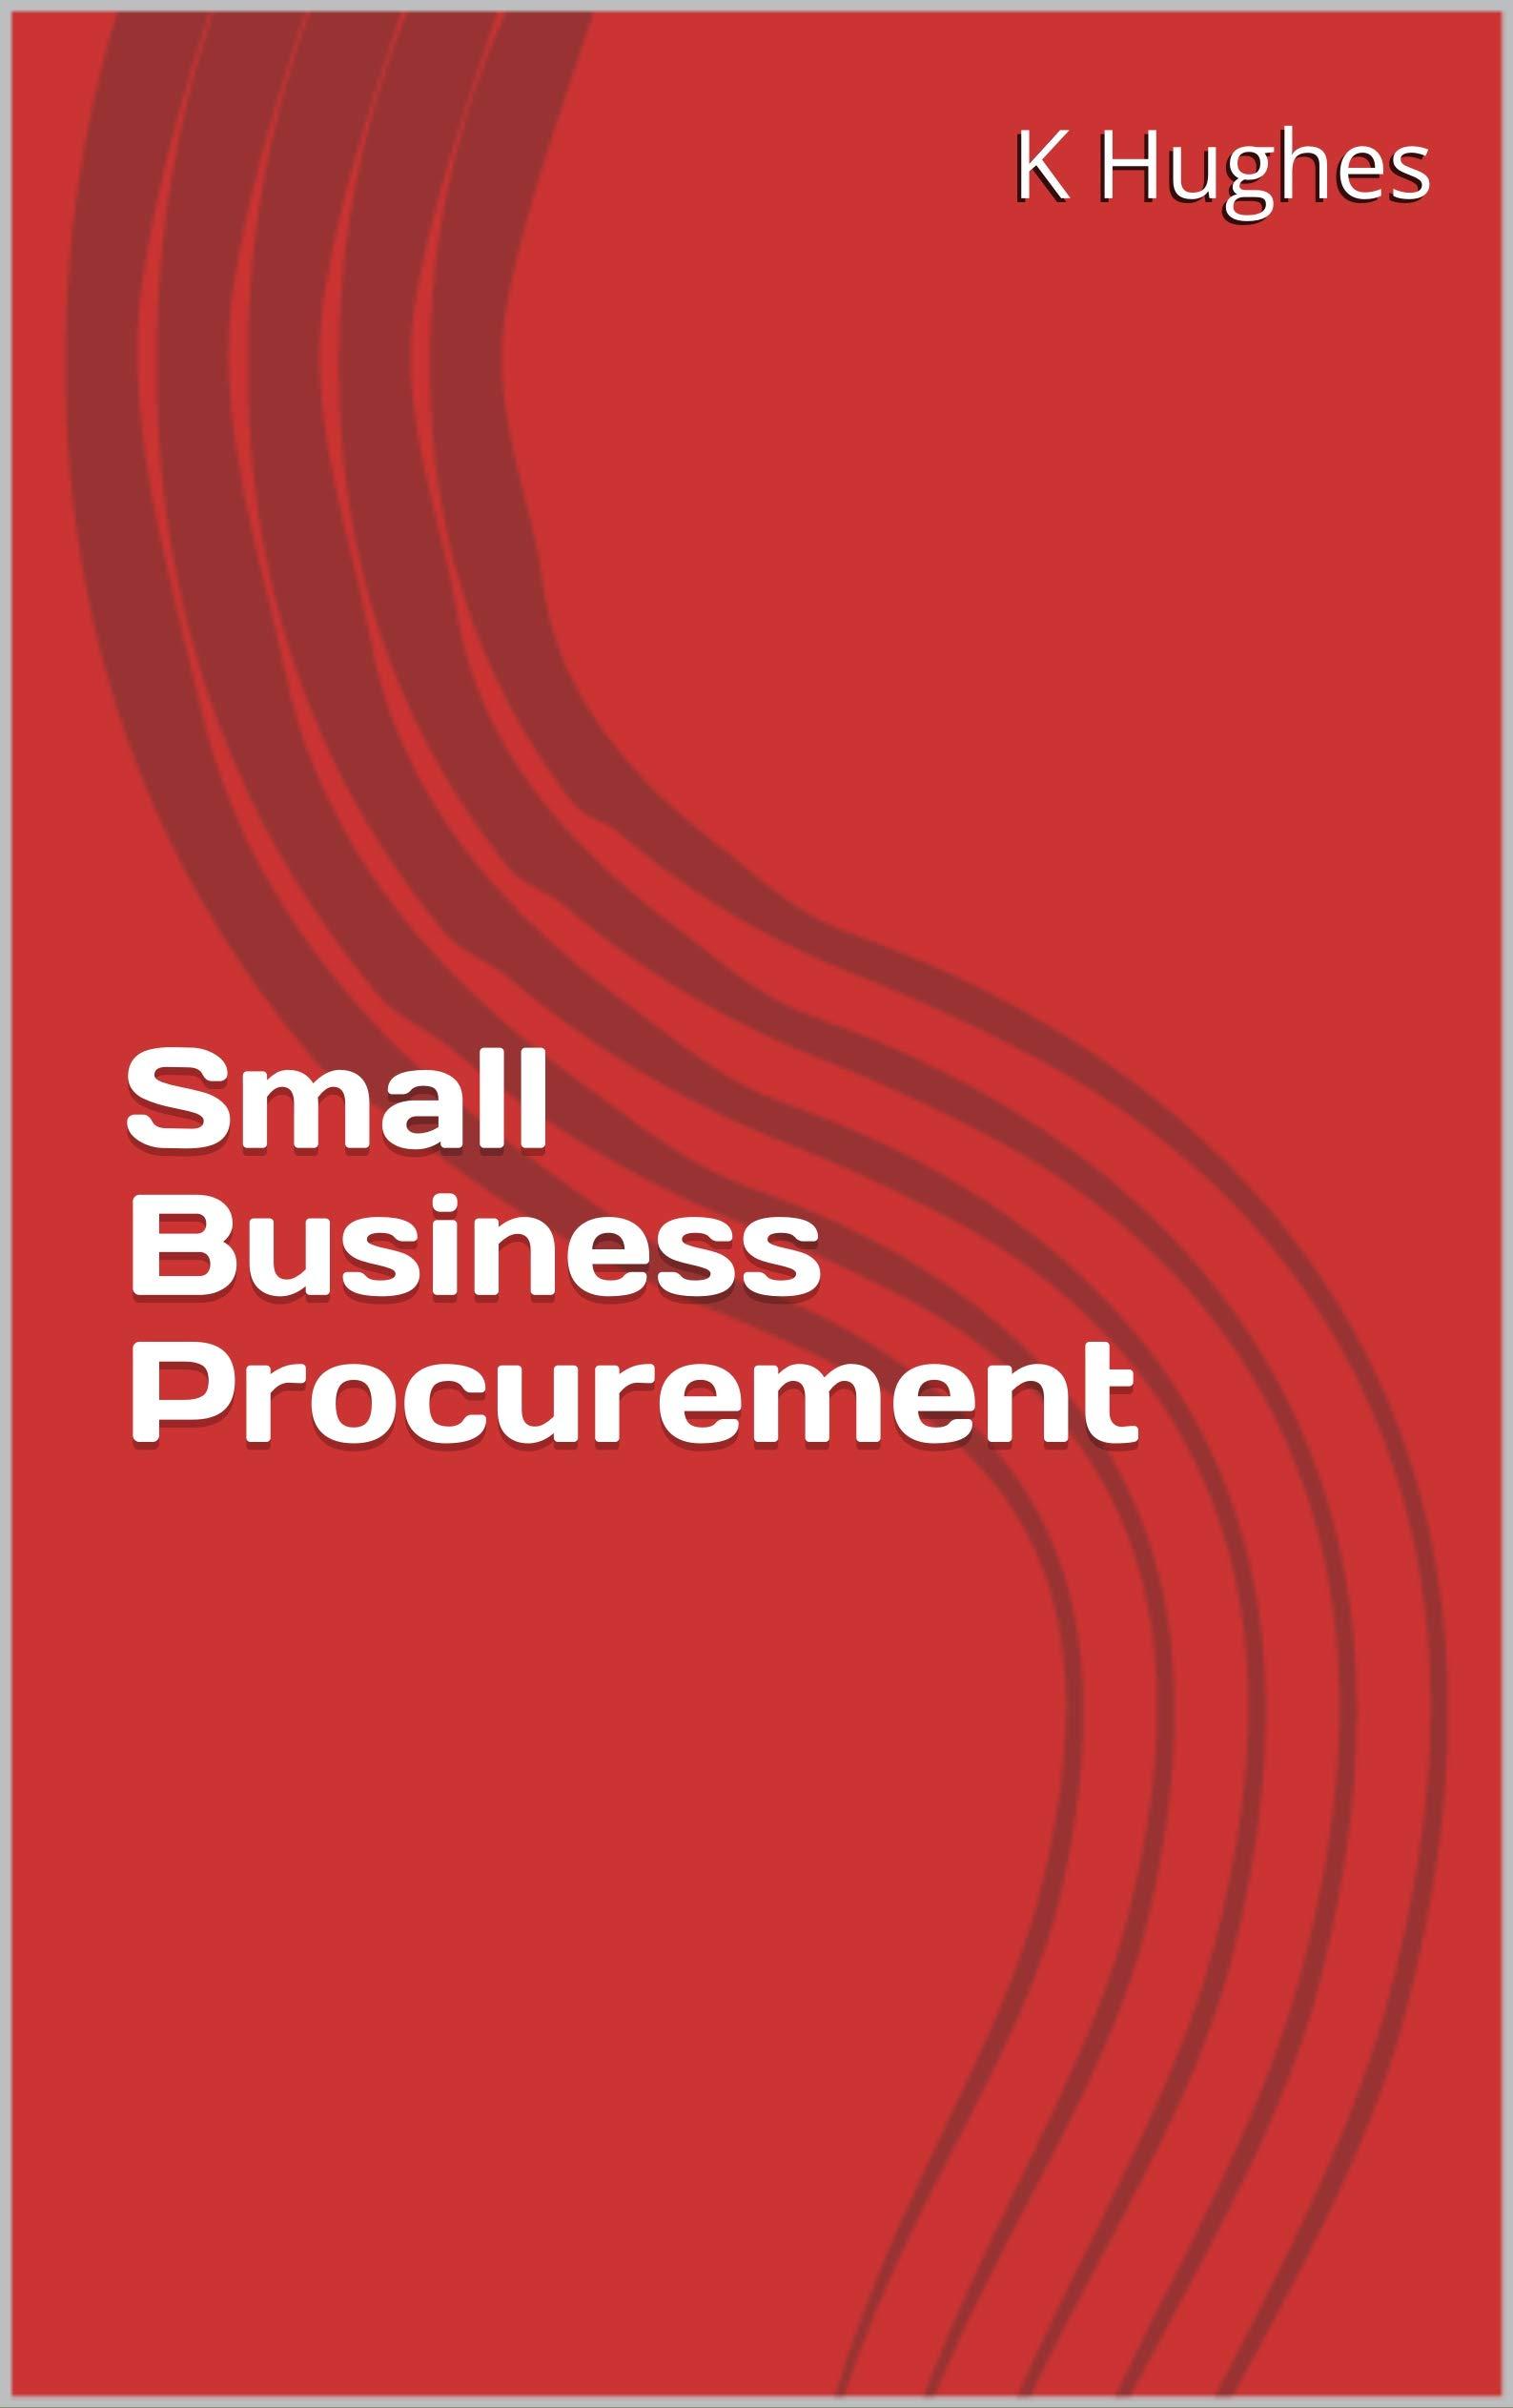 Small Business Procurement